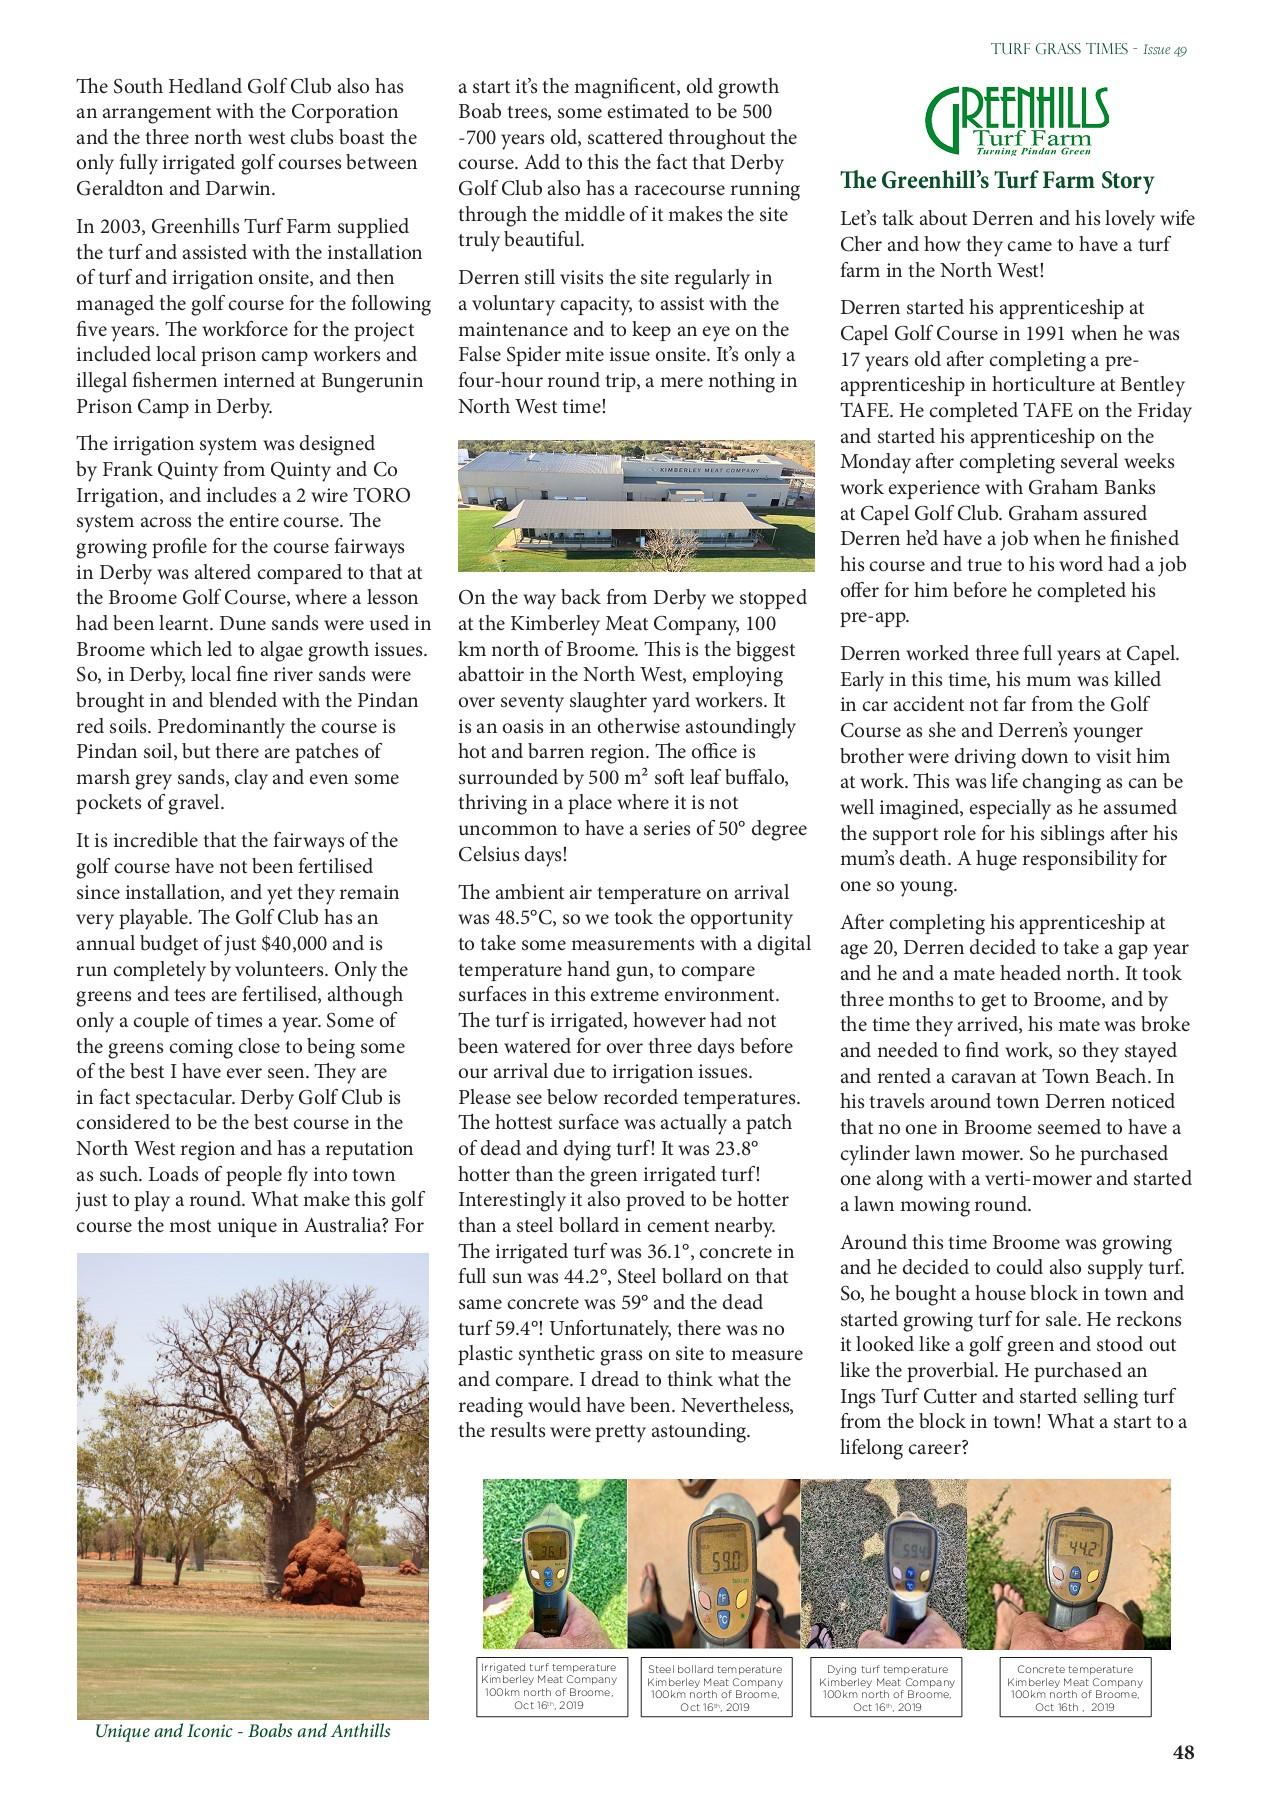 Seasons Shop Circle Pattern Spot Sprinkler Ideal for Small Rectangular Lawns judicious